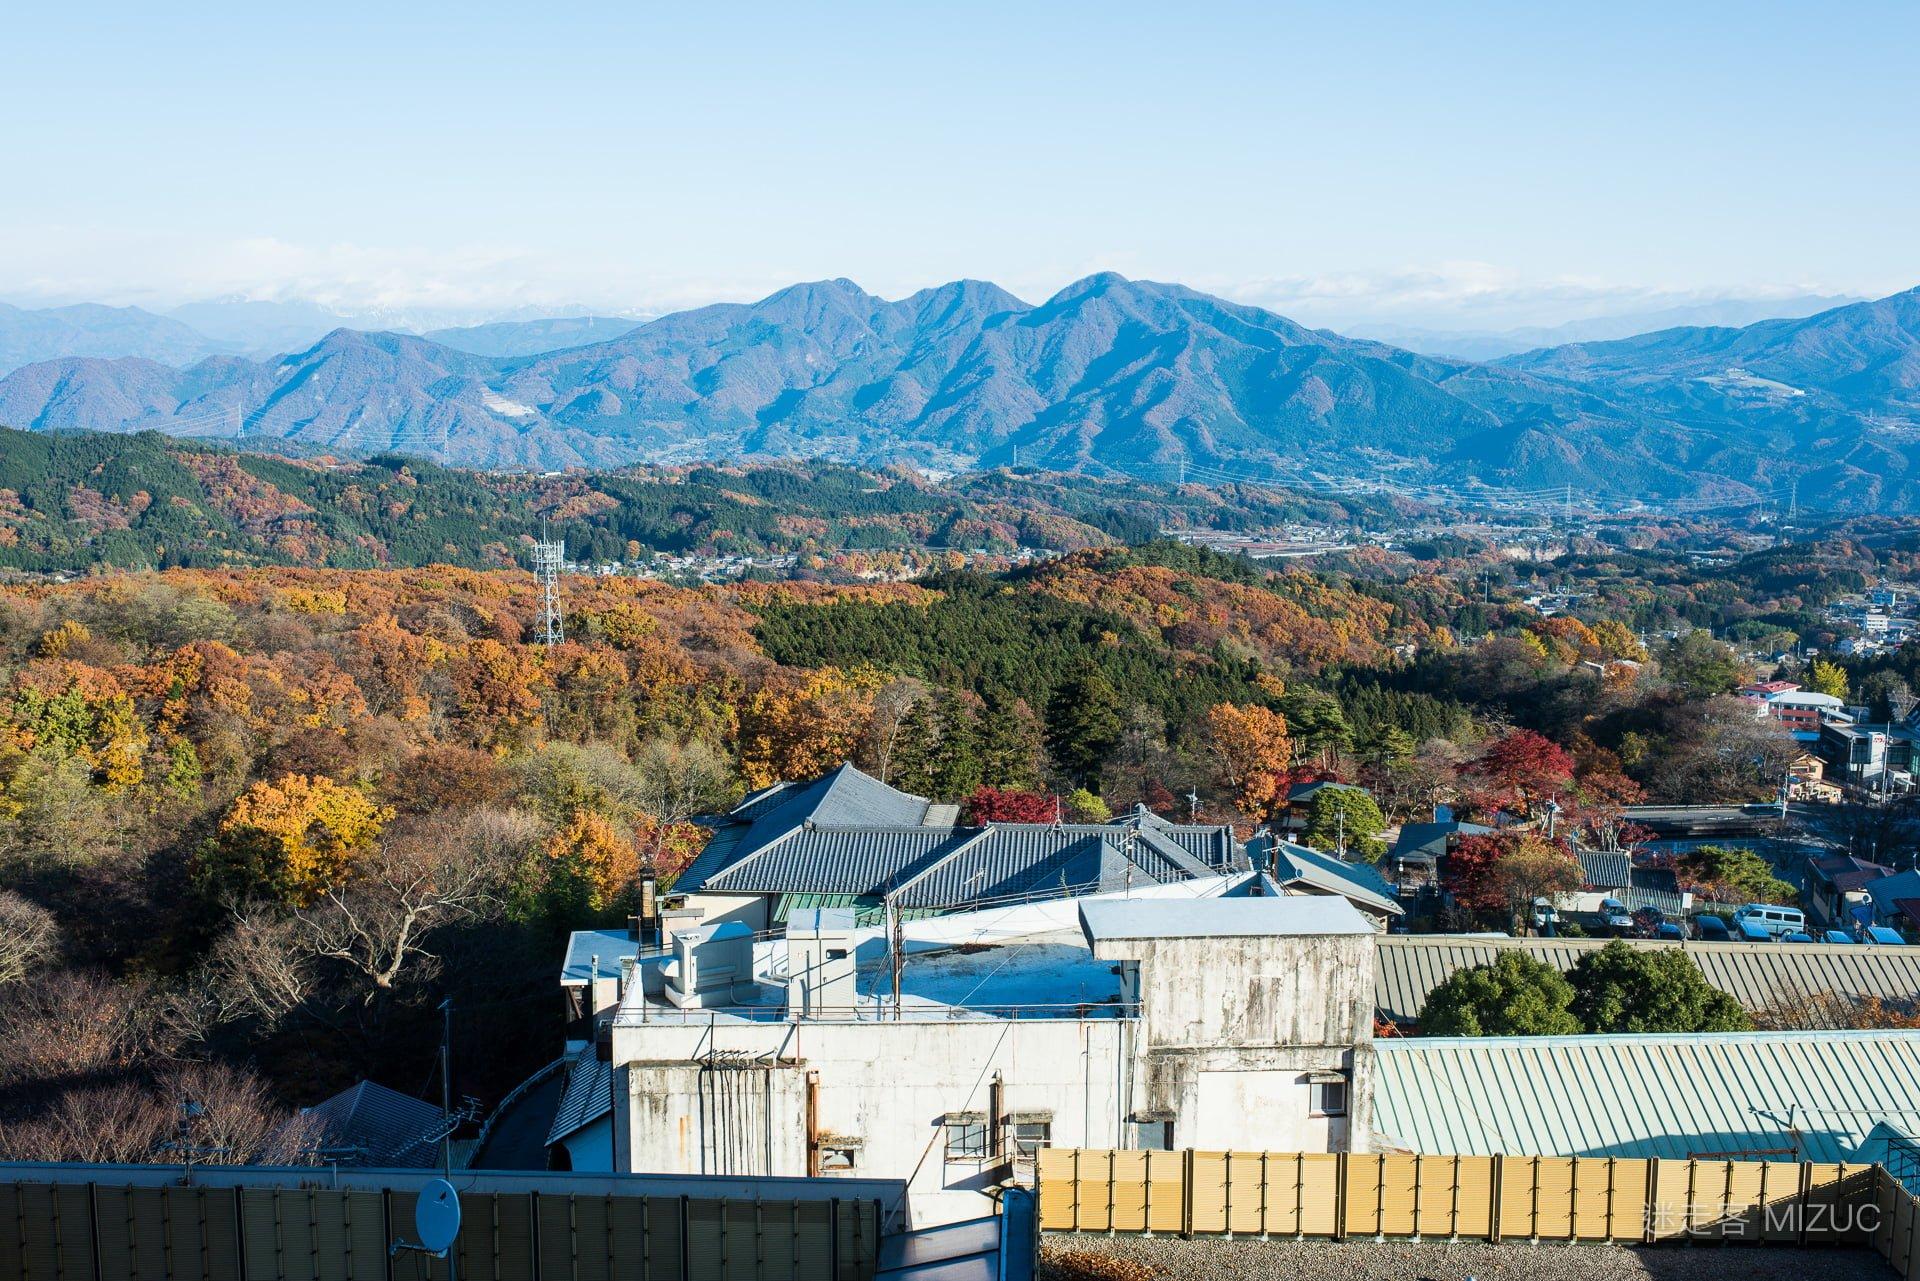 201711 Ibaraki Tochigi Gunma Japan Travel By RentalCar 76 日本自駕旅遊/北關東三縣「茨城、櫪木、群馬」秋天美食、溫泉與瀑布秘境百景(精選照片分享)